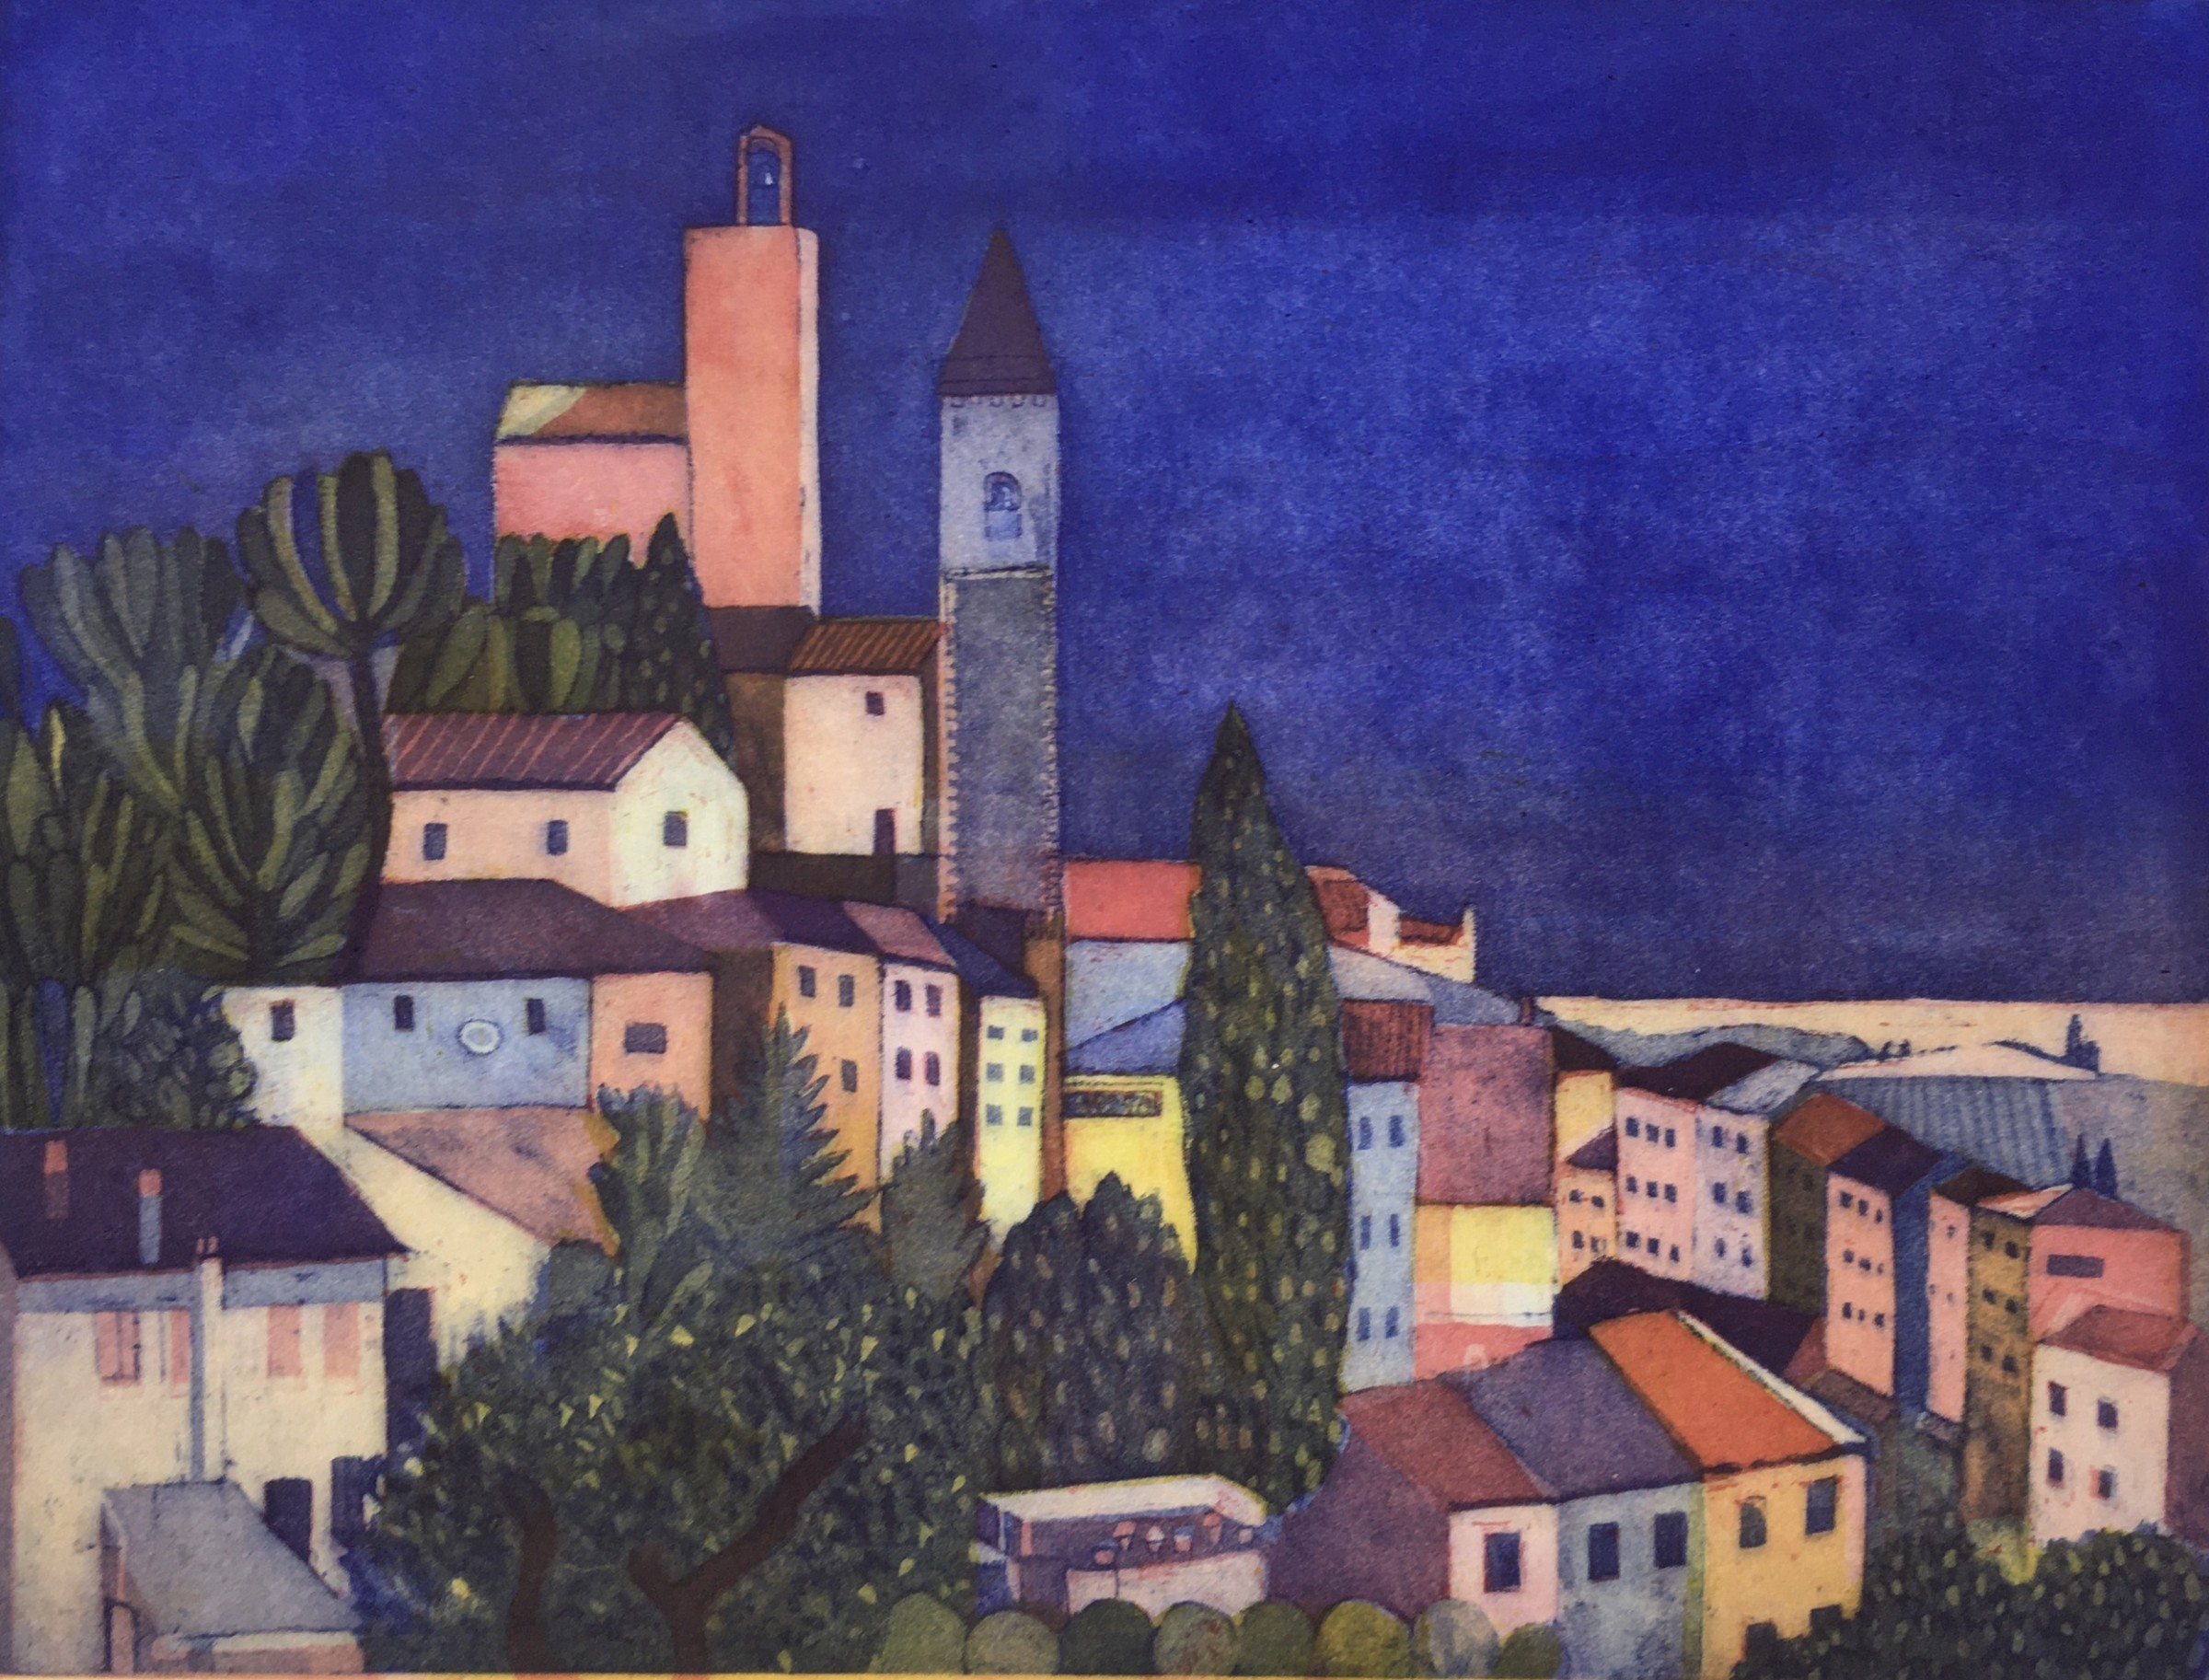 "<span class=""link fancybox-details-link""><a href=""/artists/86-karen-keogh-re/works/11062/"">View Detail Page</a></span><div class=""artist""><span class=""artist""><strong>Karen Keogh RE</strong></span></div><div class=""title""><em>Dopo Pranzo, Toscana</em></div><div class=""medium"">etching</div><div class=""dimensions"">40 x 50 cm framed size<br /> 30 x 40 cm image size</div><div class=""edition_details"">edition of 75</div><div class=""price"">£390.00 framed<br>£290.00 unframed</div>"